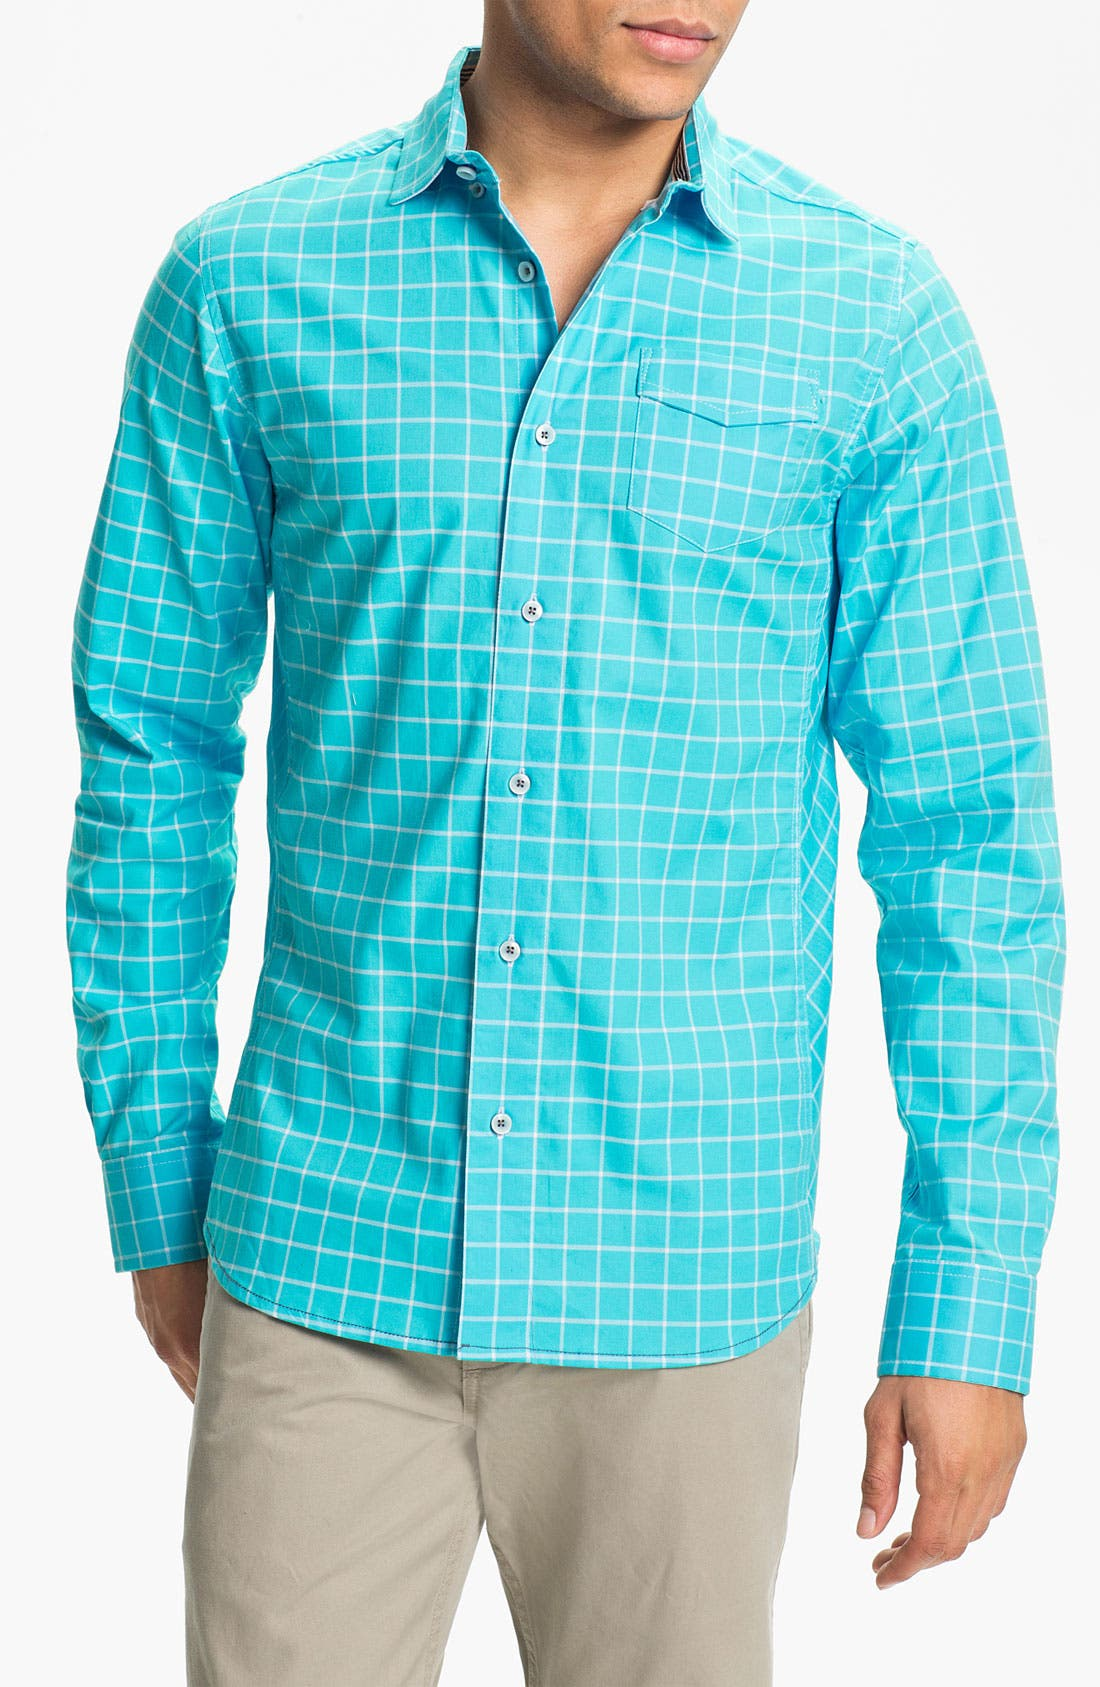 Alternate Image 1 Selected - Descendant of Thieves Windowpane Woven Shirt